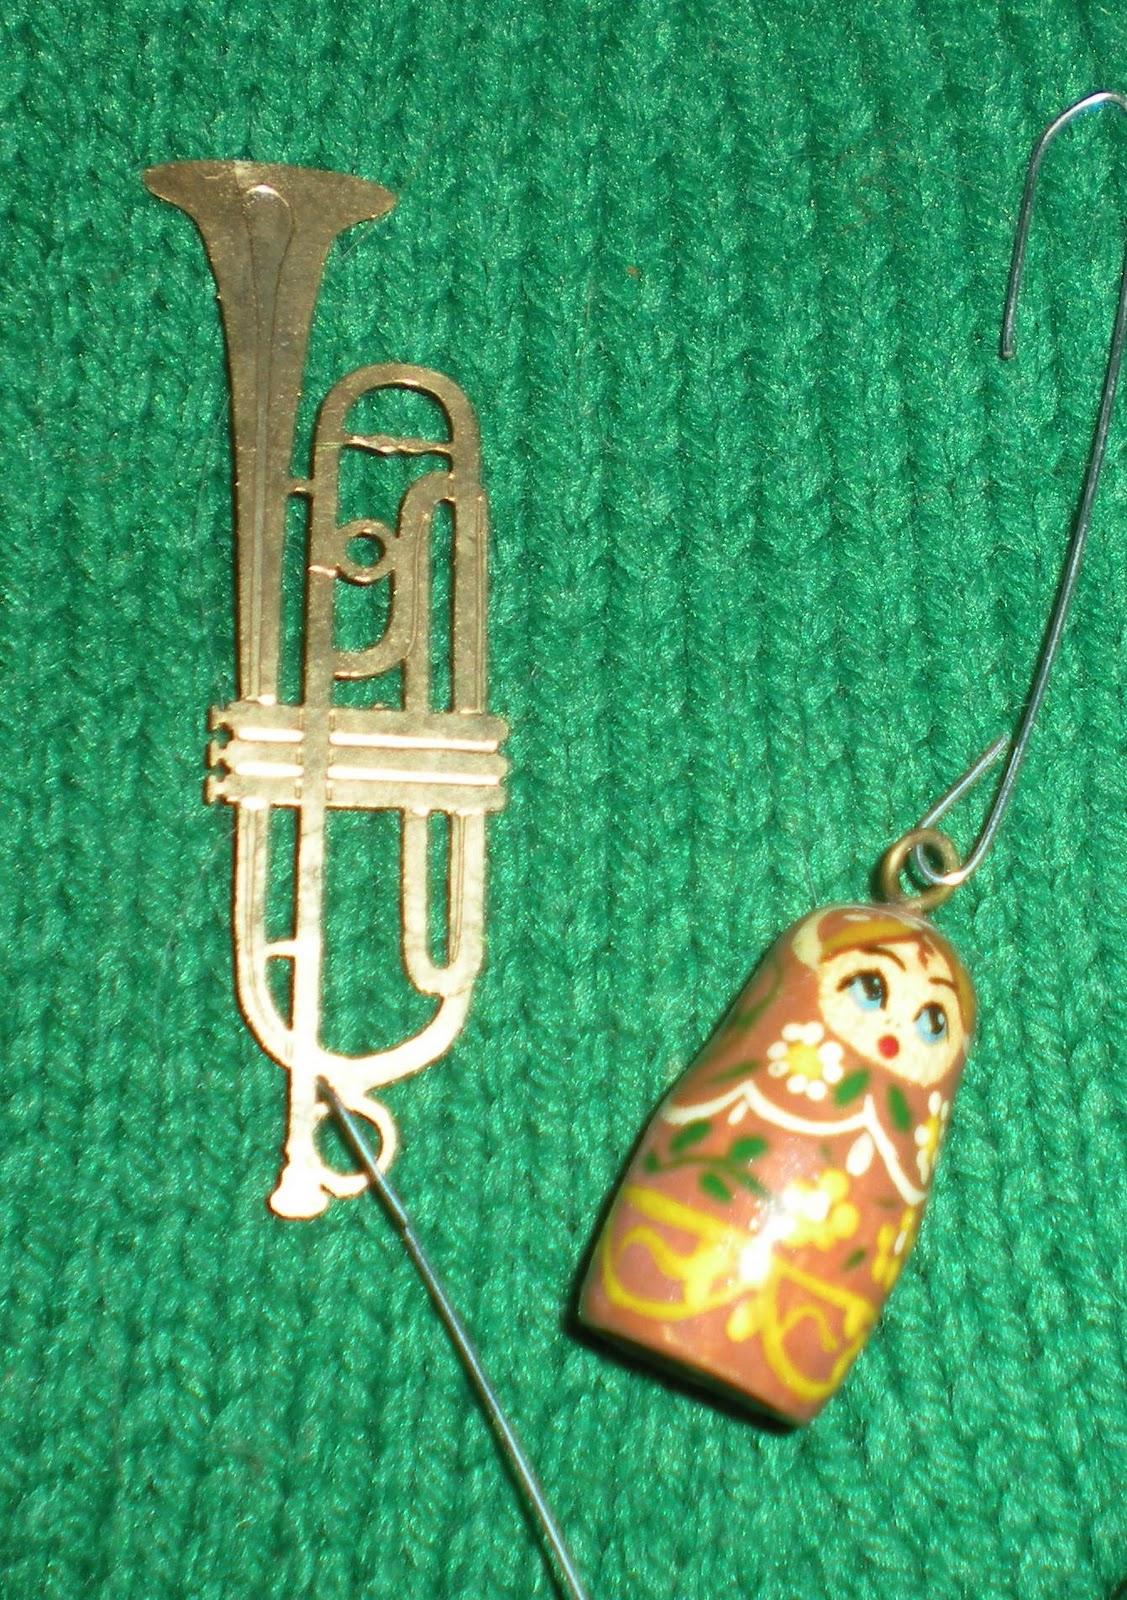 http://1.bp.blogspot.com/_qefC8FCB4oU/TSs76Rzl2hI/AAAAAAAAPVs/oj86TlYCoxo/s1600/ornaments.jpg